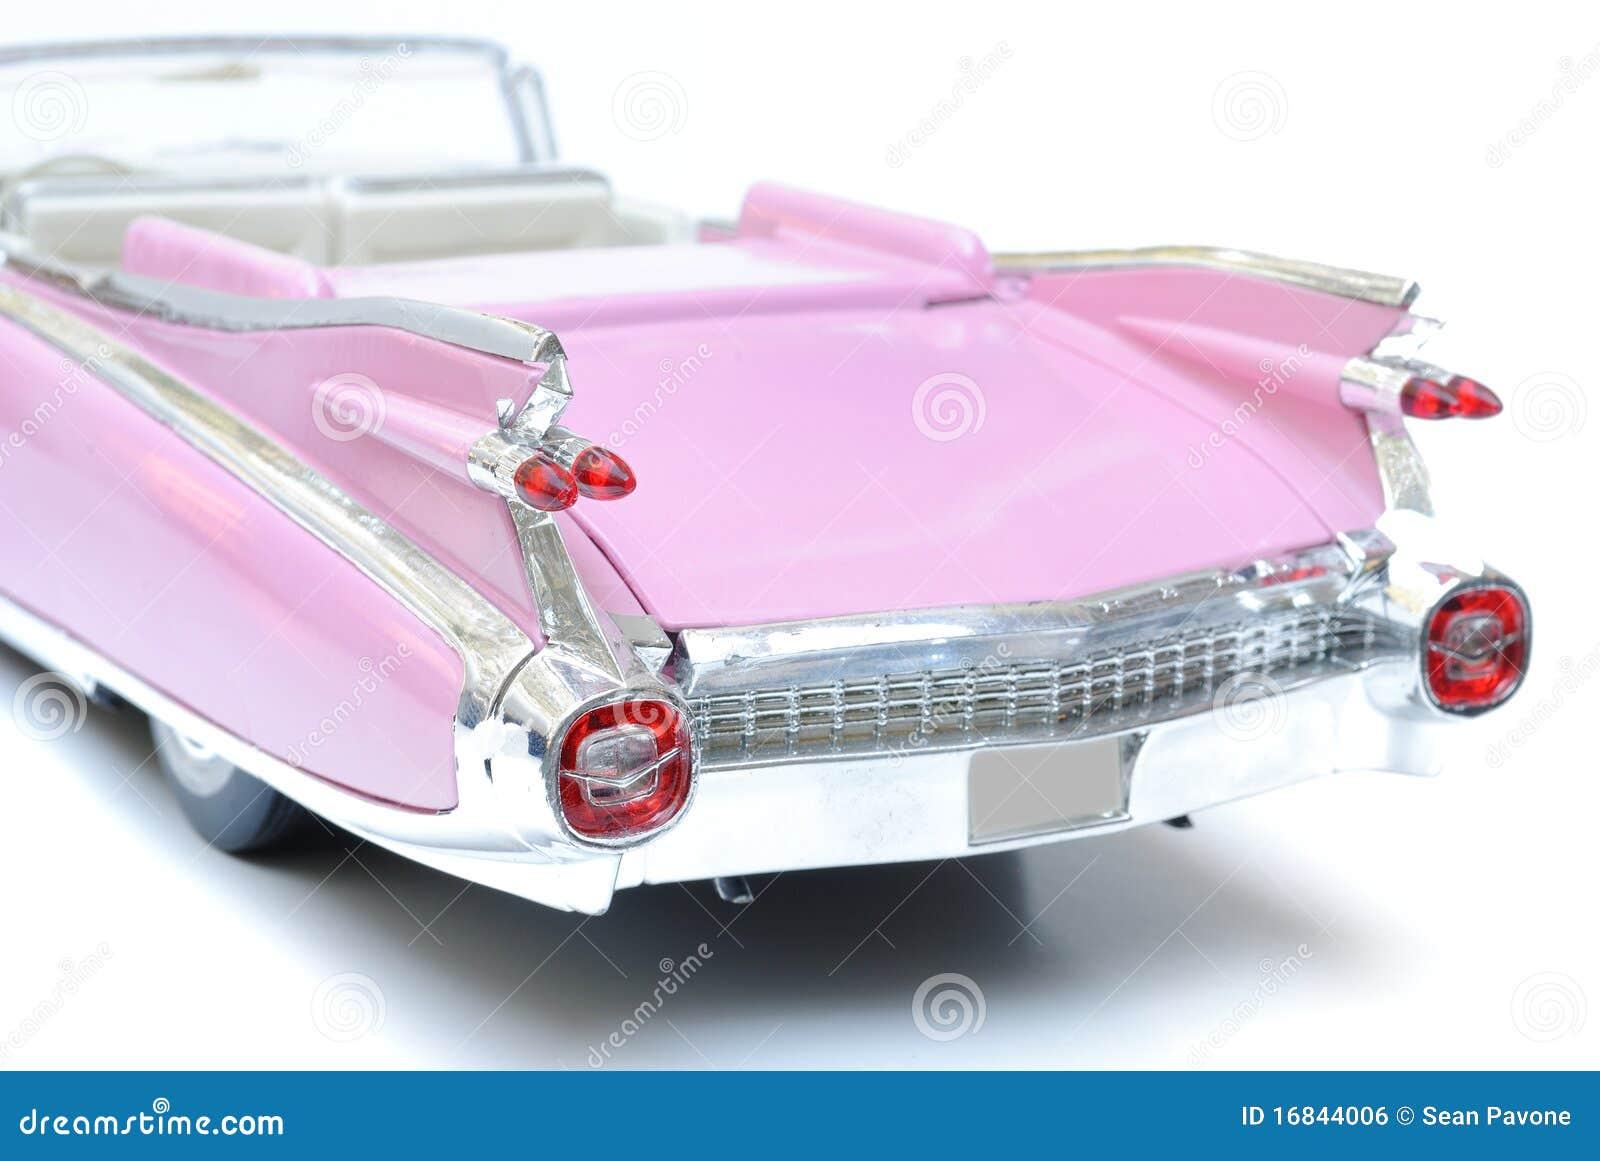 Pink Cadillac Royalty Free Stock Image - Image: 16844006